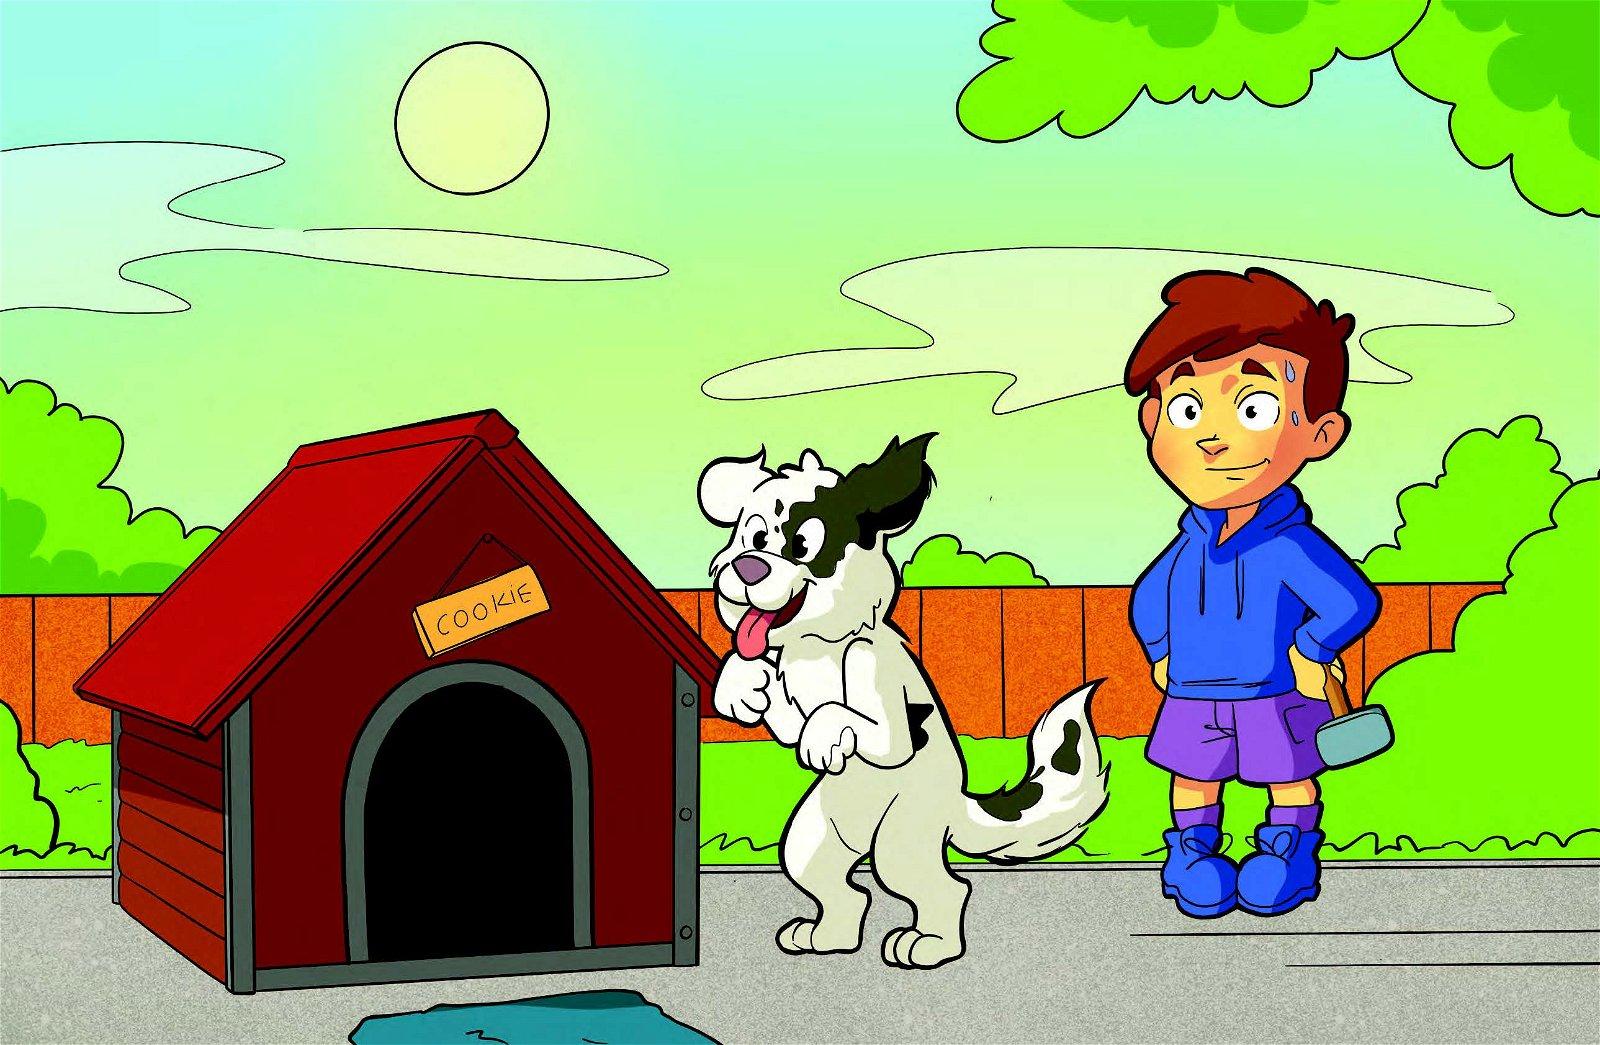 Cookie's Doghouse Dilemma